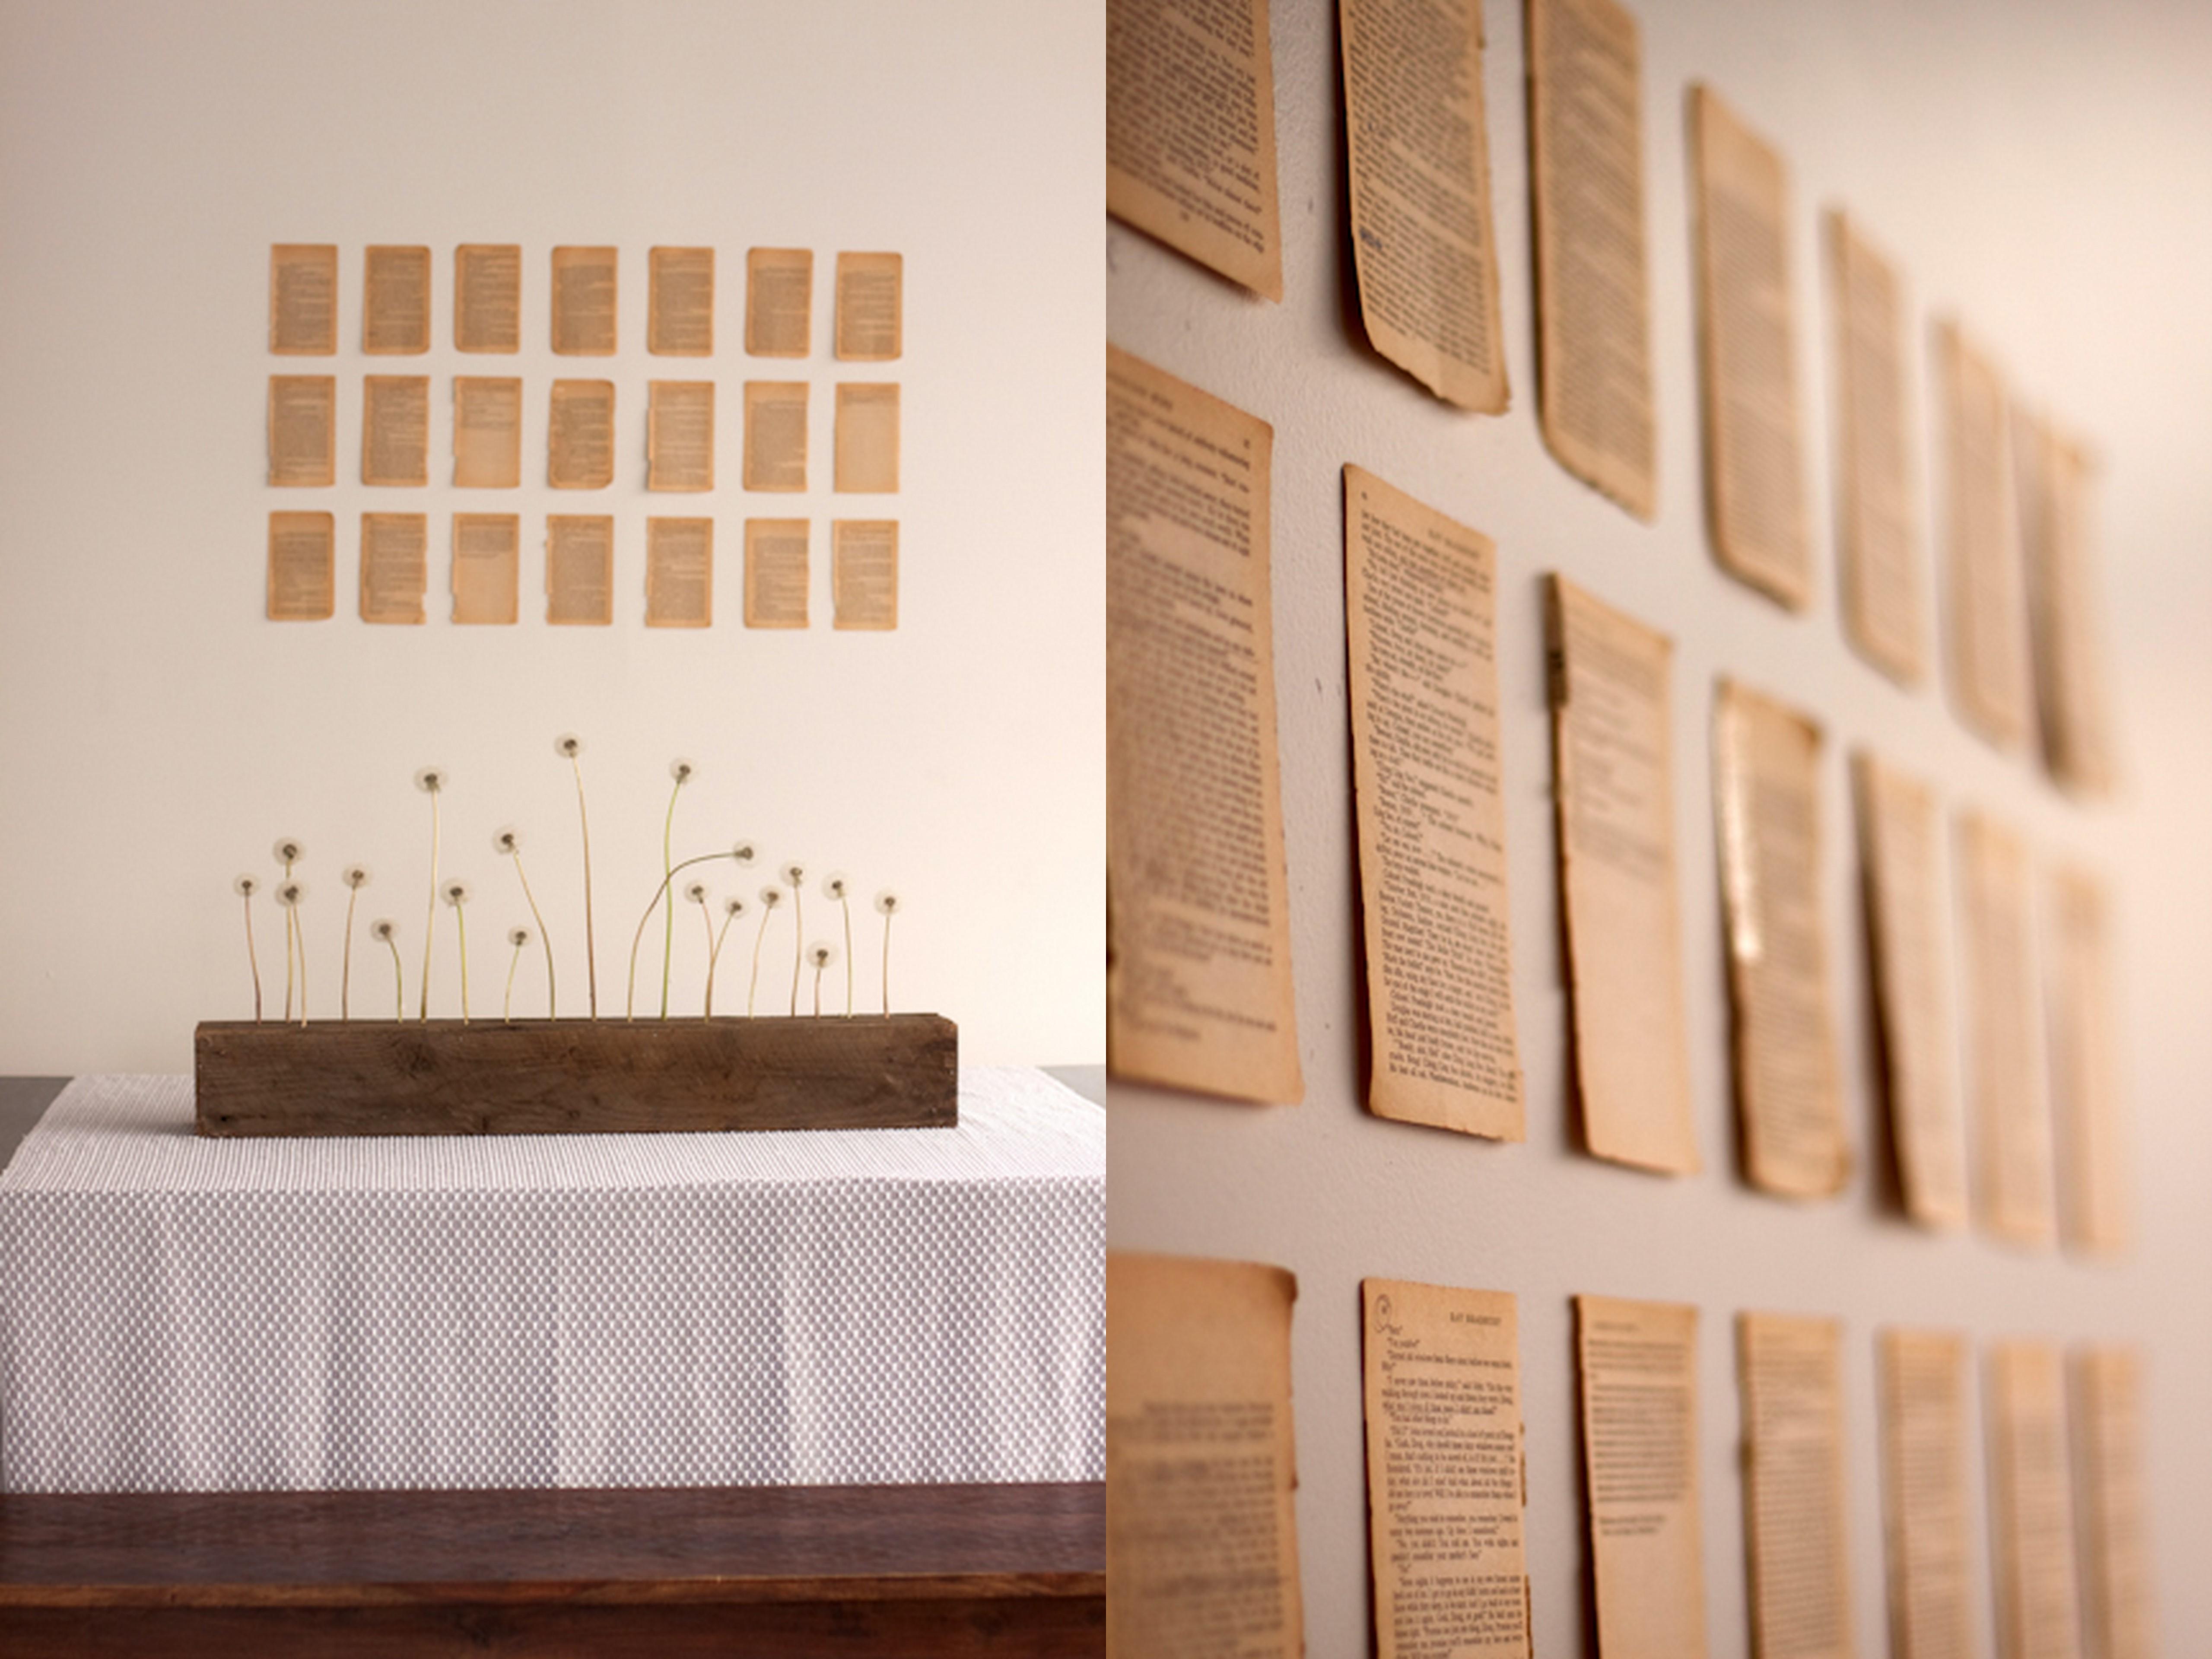 dandelion-wine-vintage-books-wedding-ideas